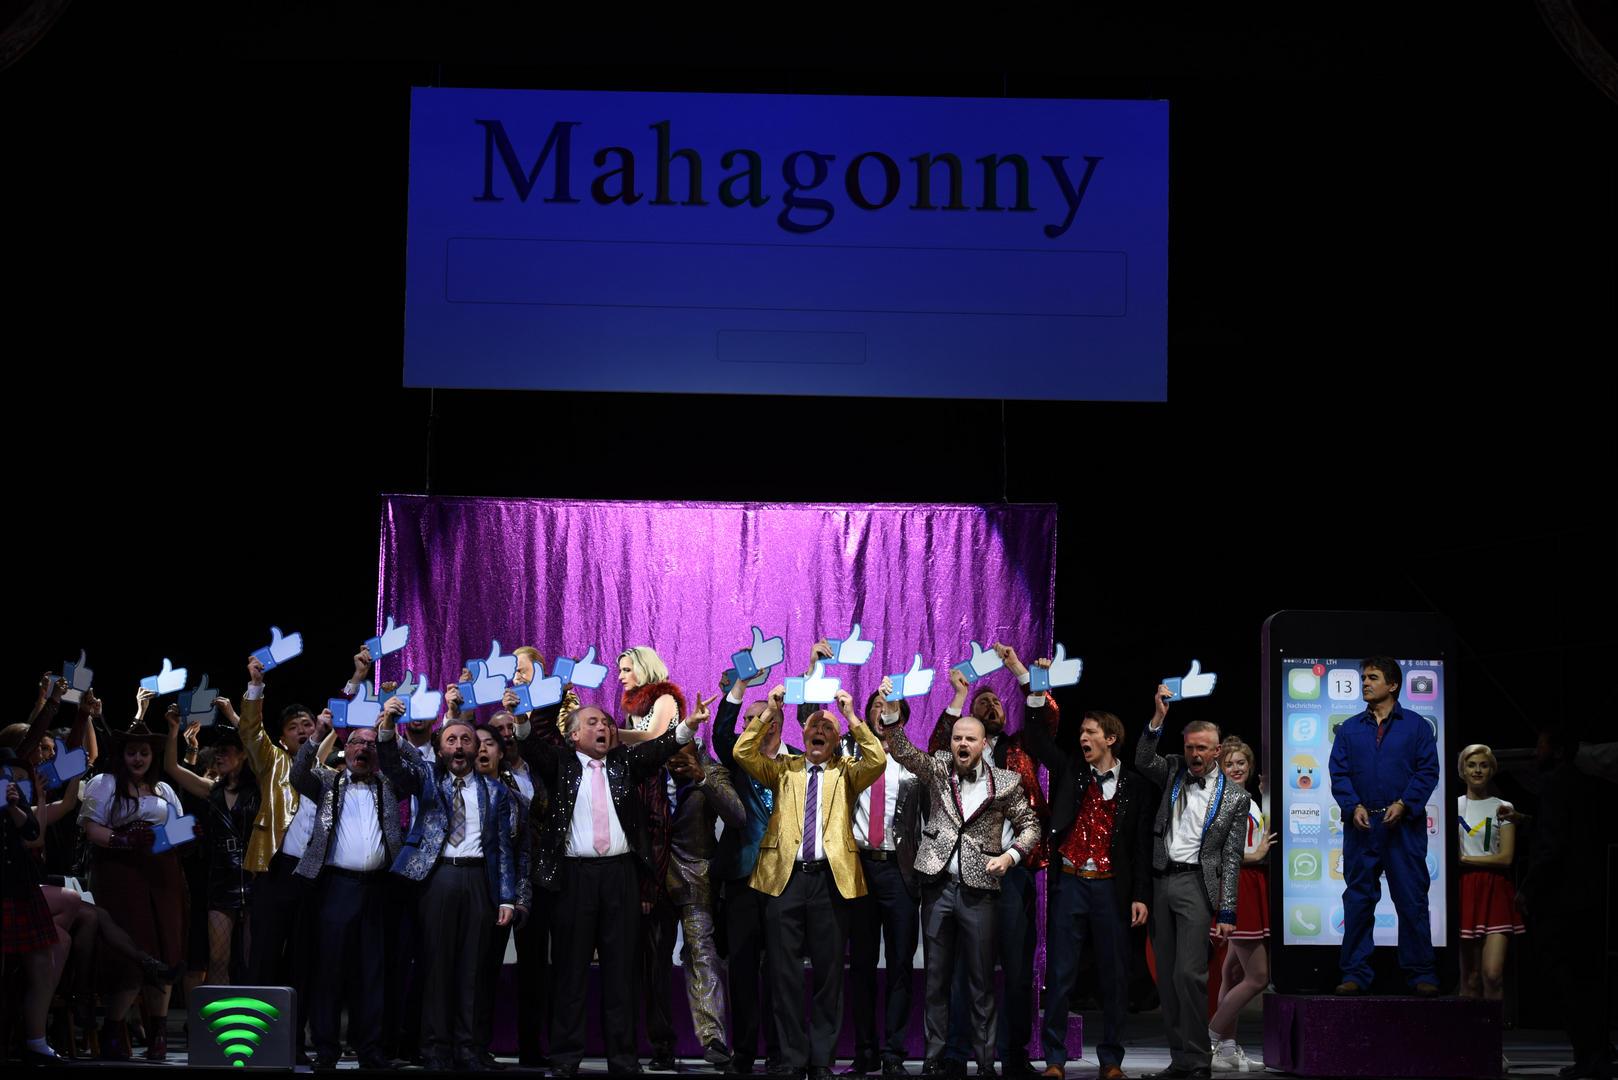 Mahagonny-Opera-by-Kurt-Weill-Stage-director-Jacopo-Spirei-Salzburg-18